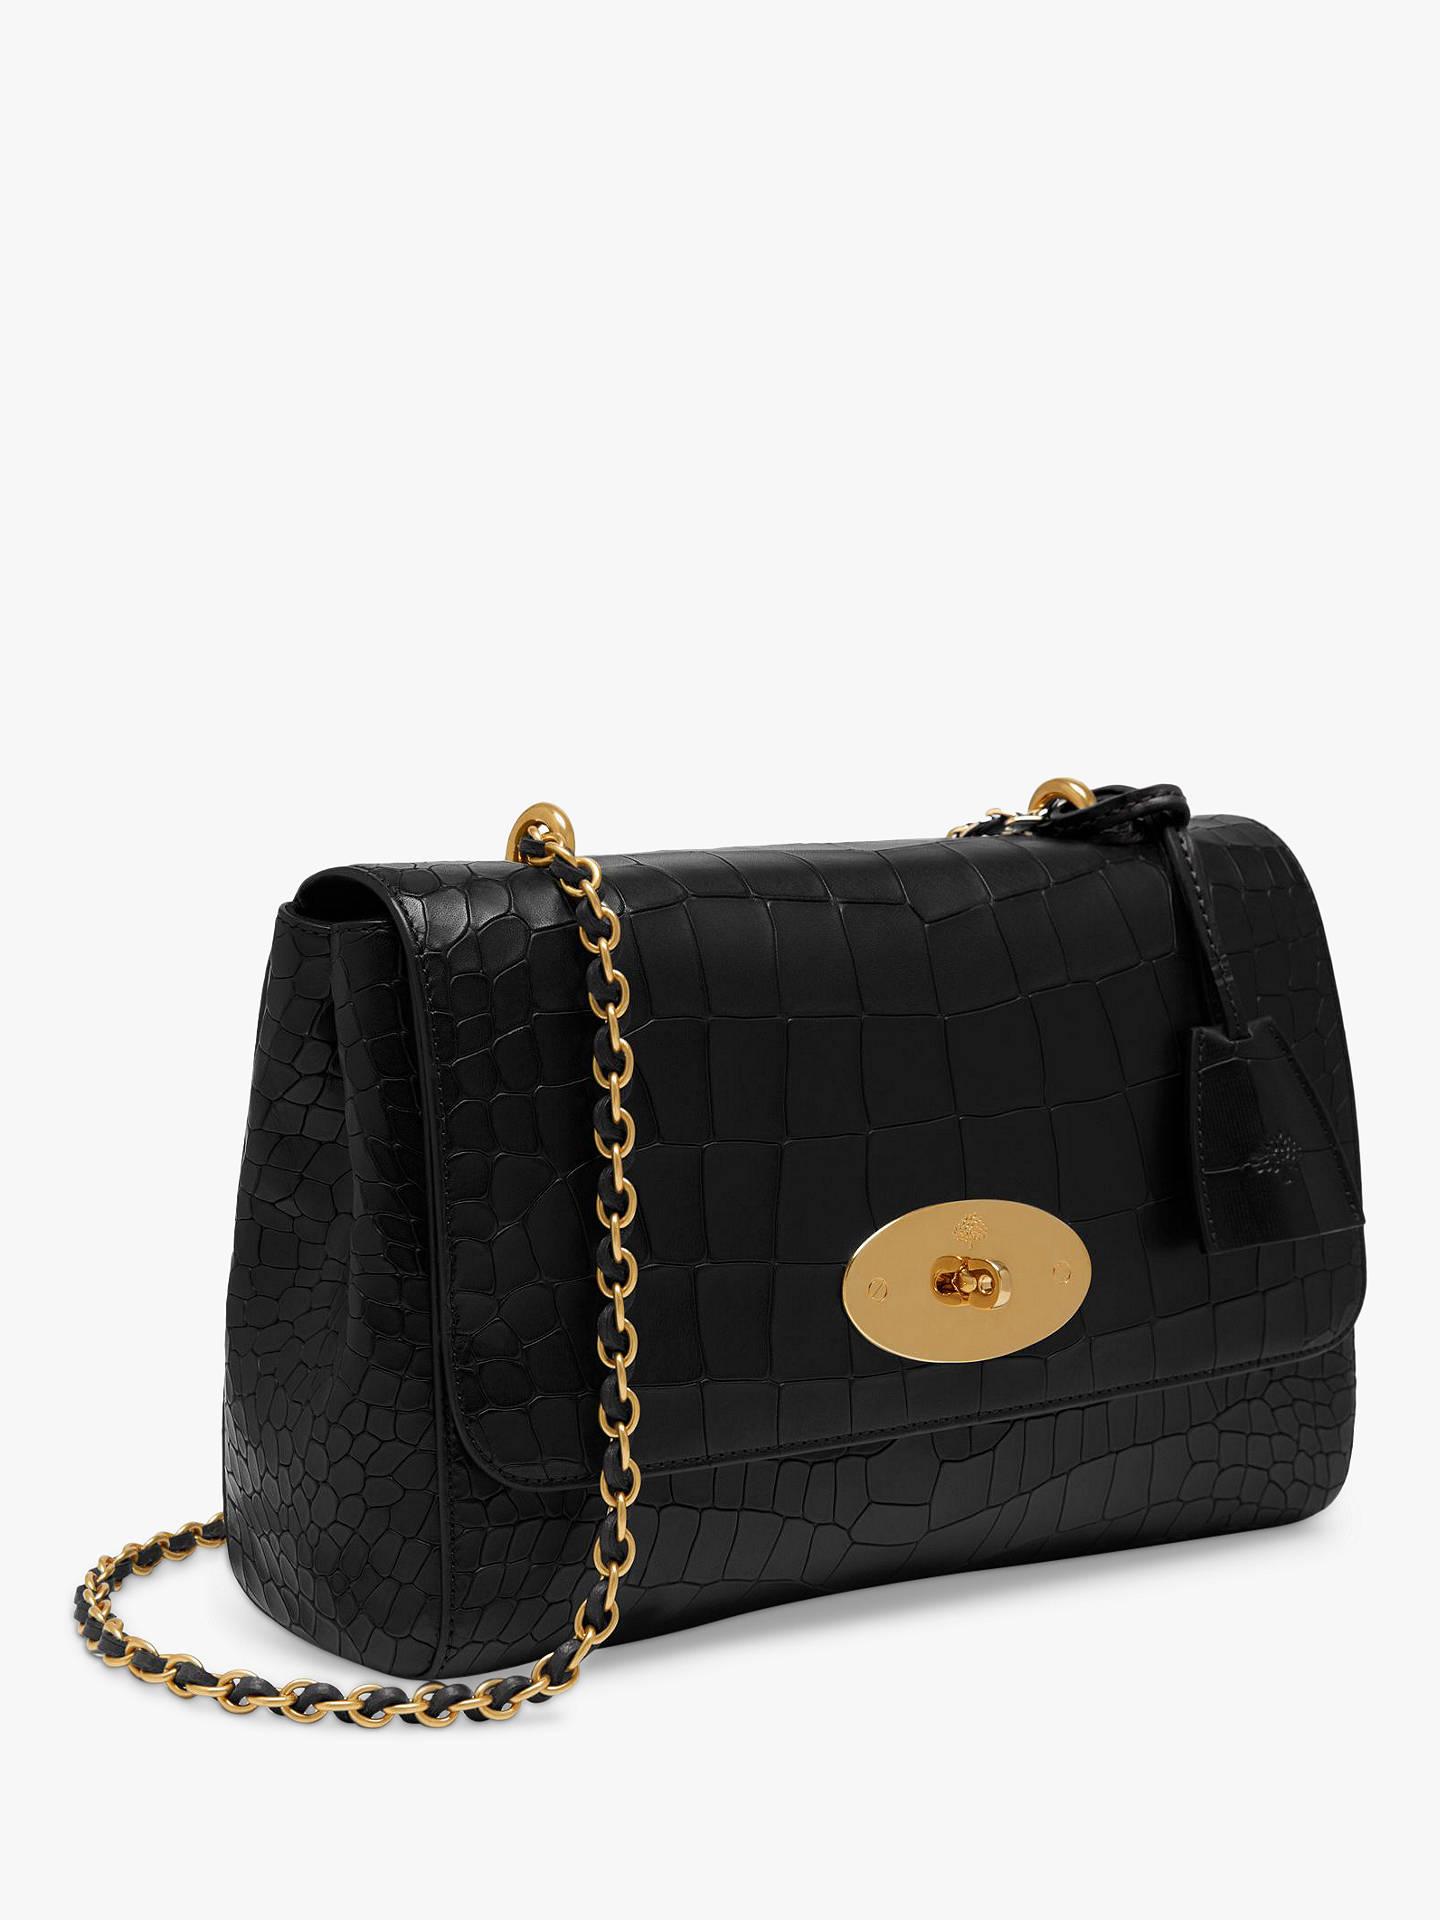 ddc04d46233b ... BuyMulberry Medium Lily Croc Embossed Leather Shoulder Bag